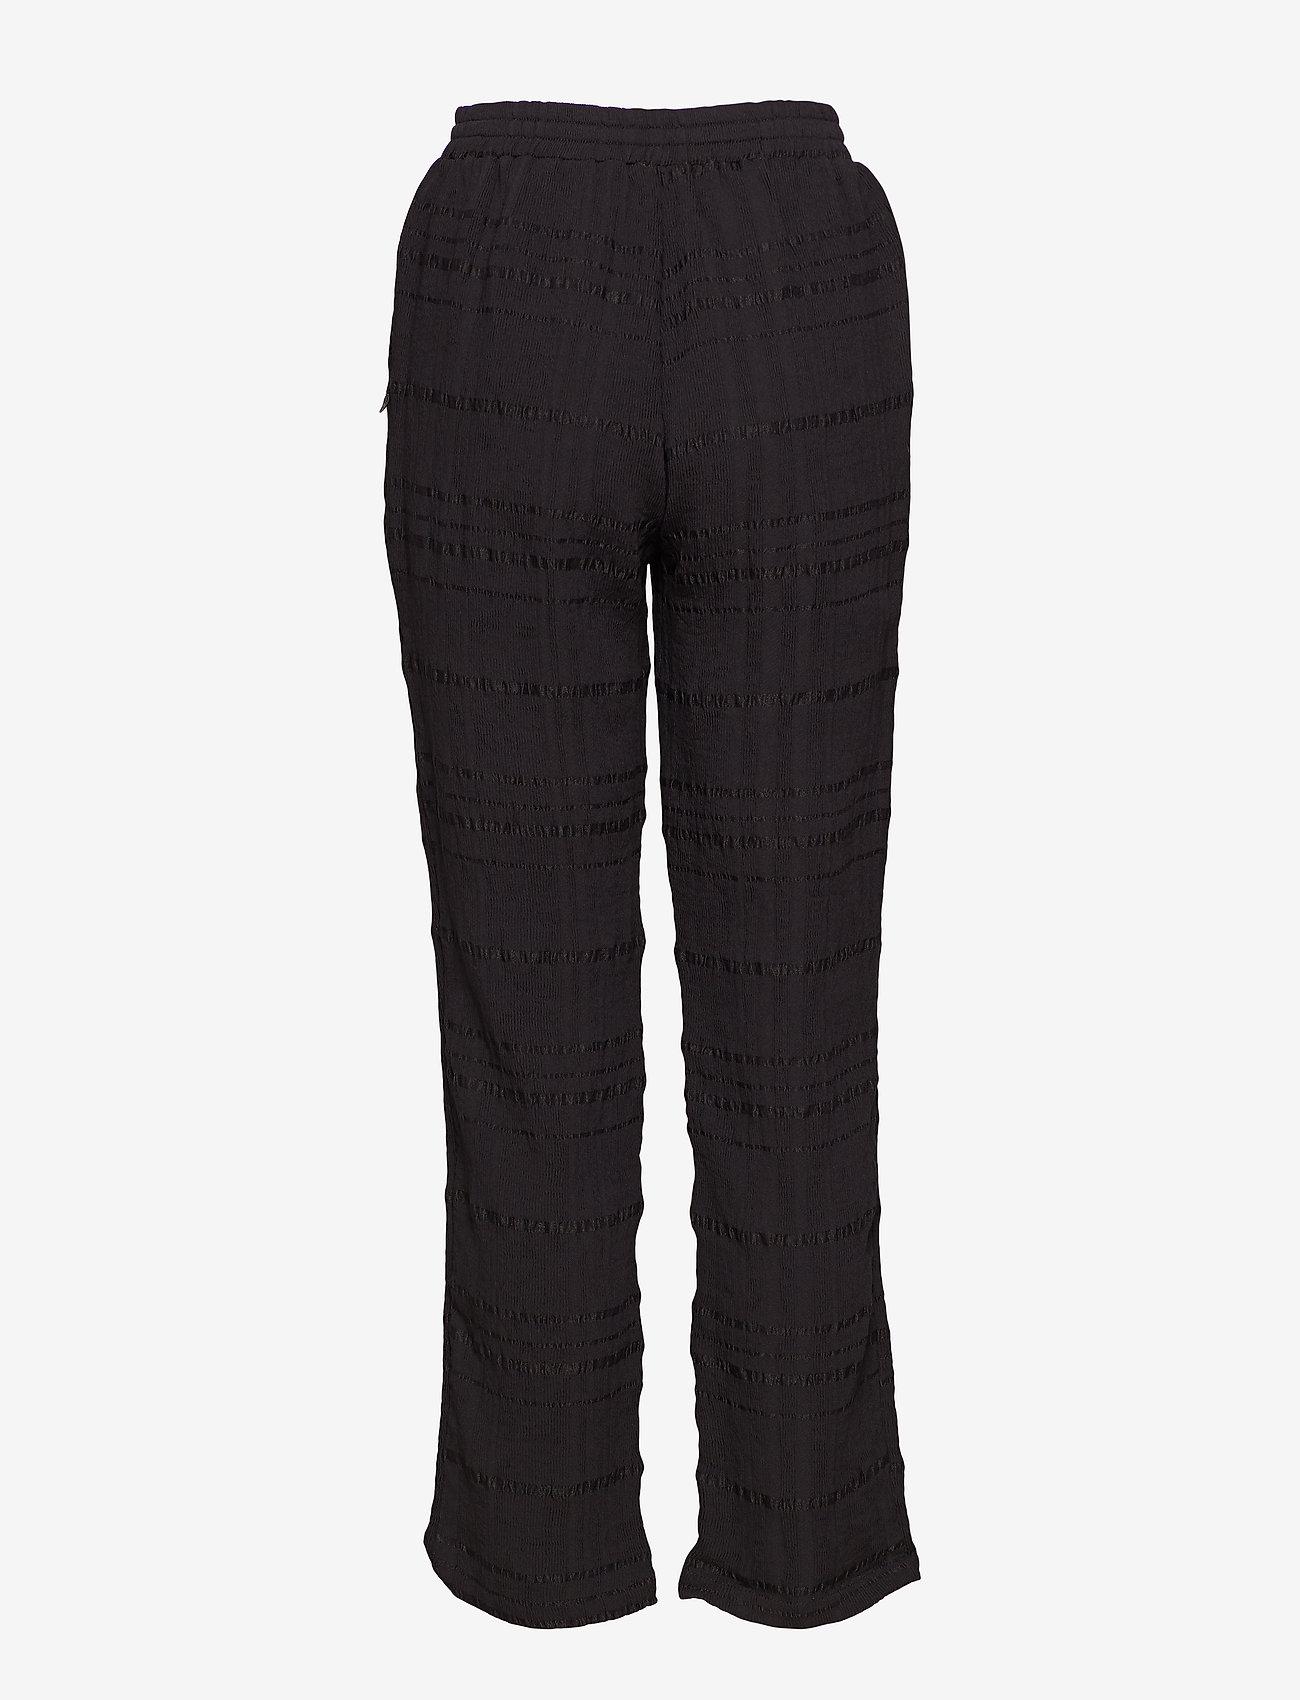 Pant W. Checks (Black) - Coster Copenhagen QxvUxH